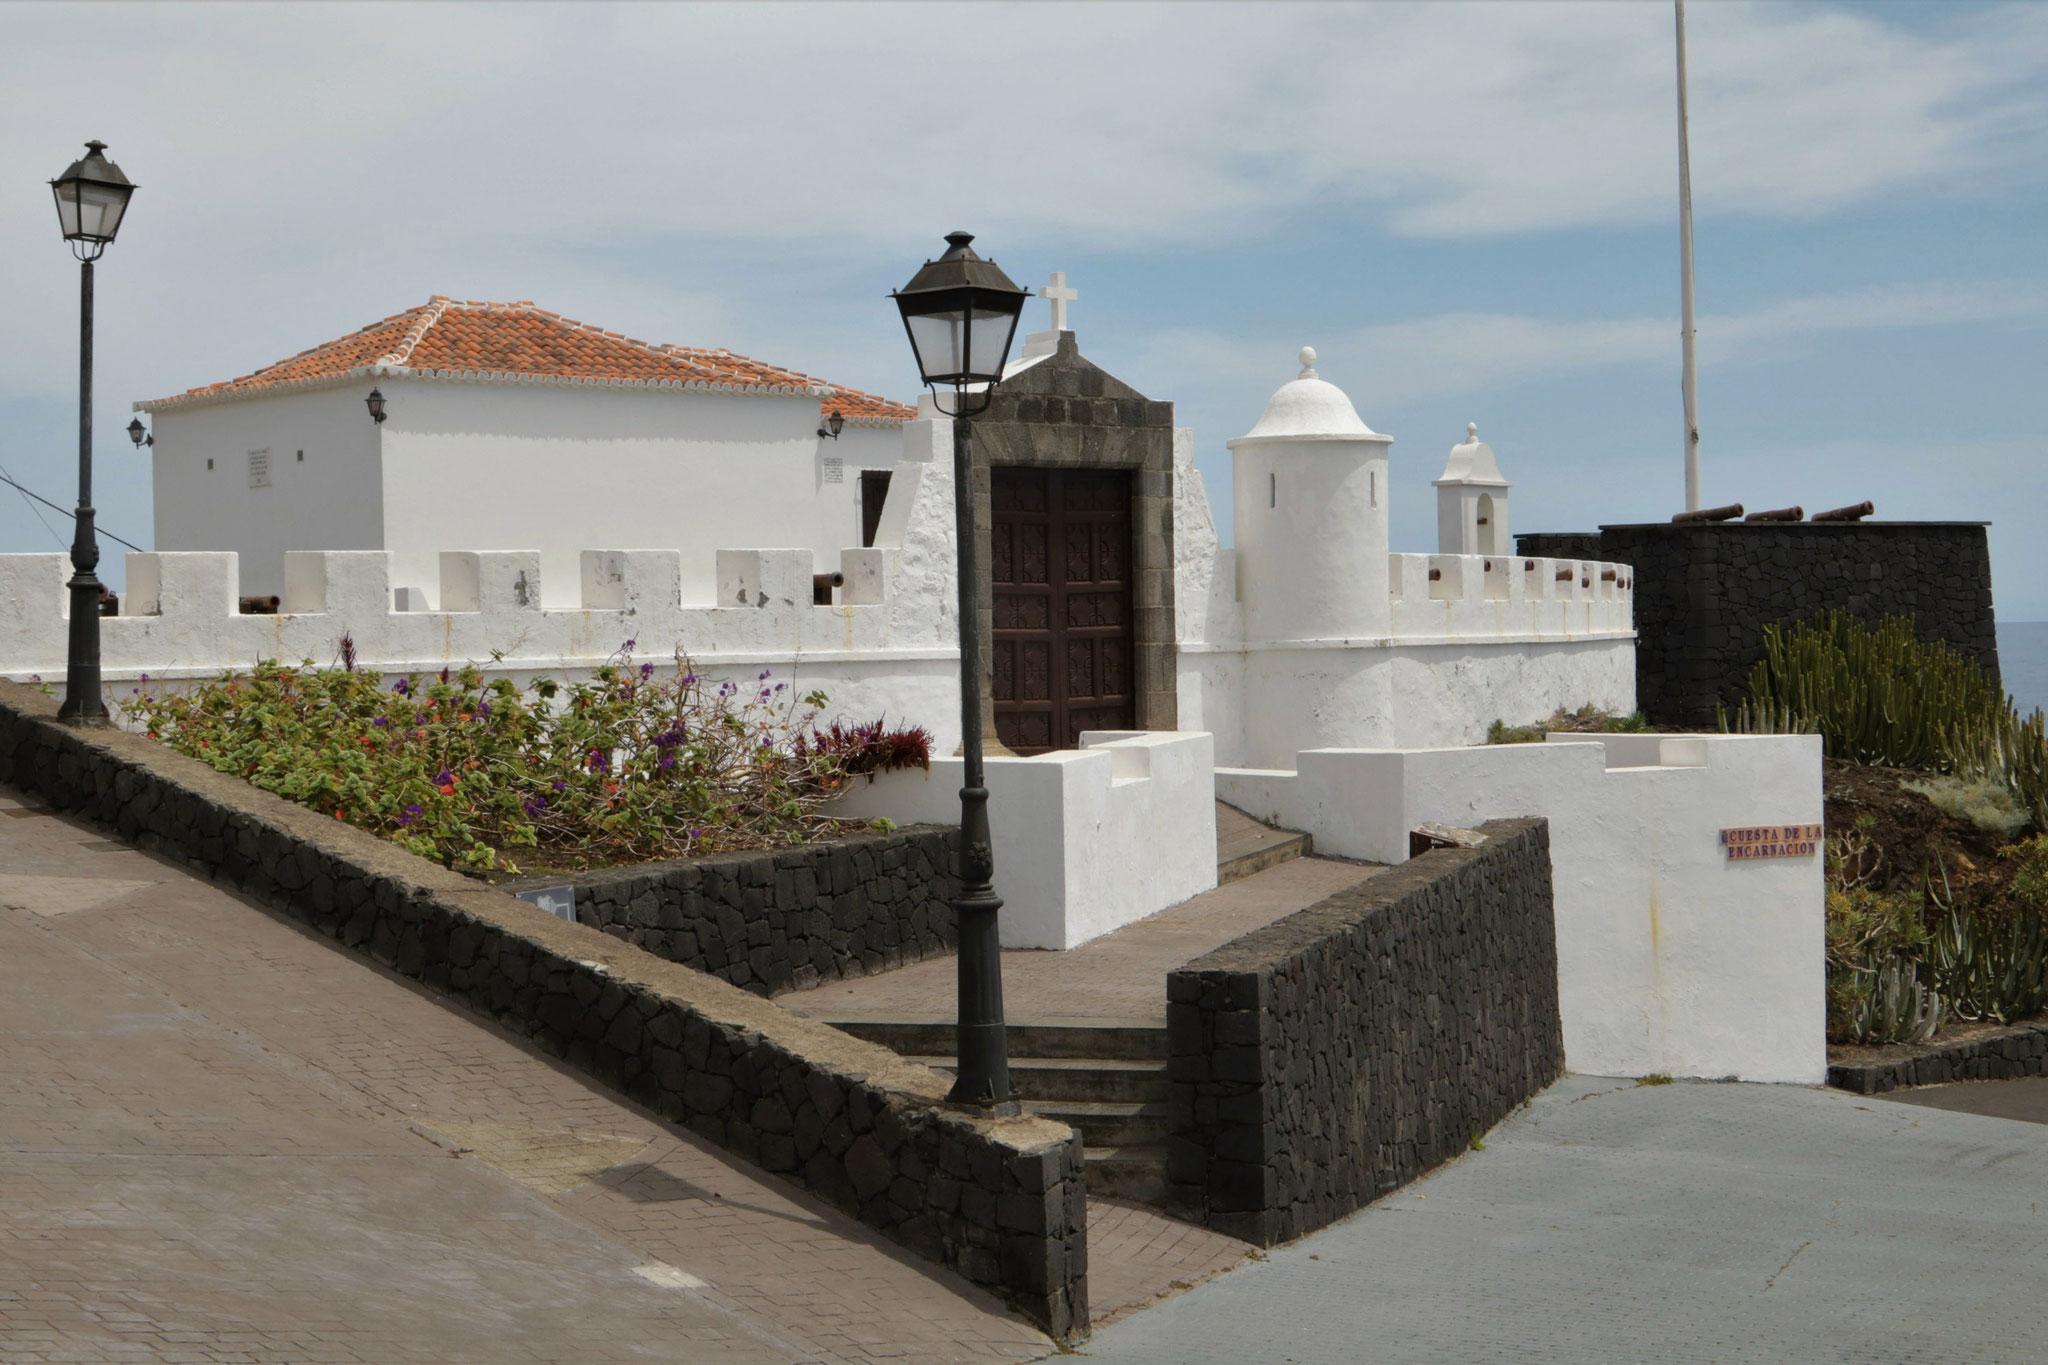 Santa Cruz de la Palma - Castillo de la Virgen